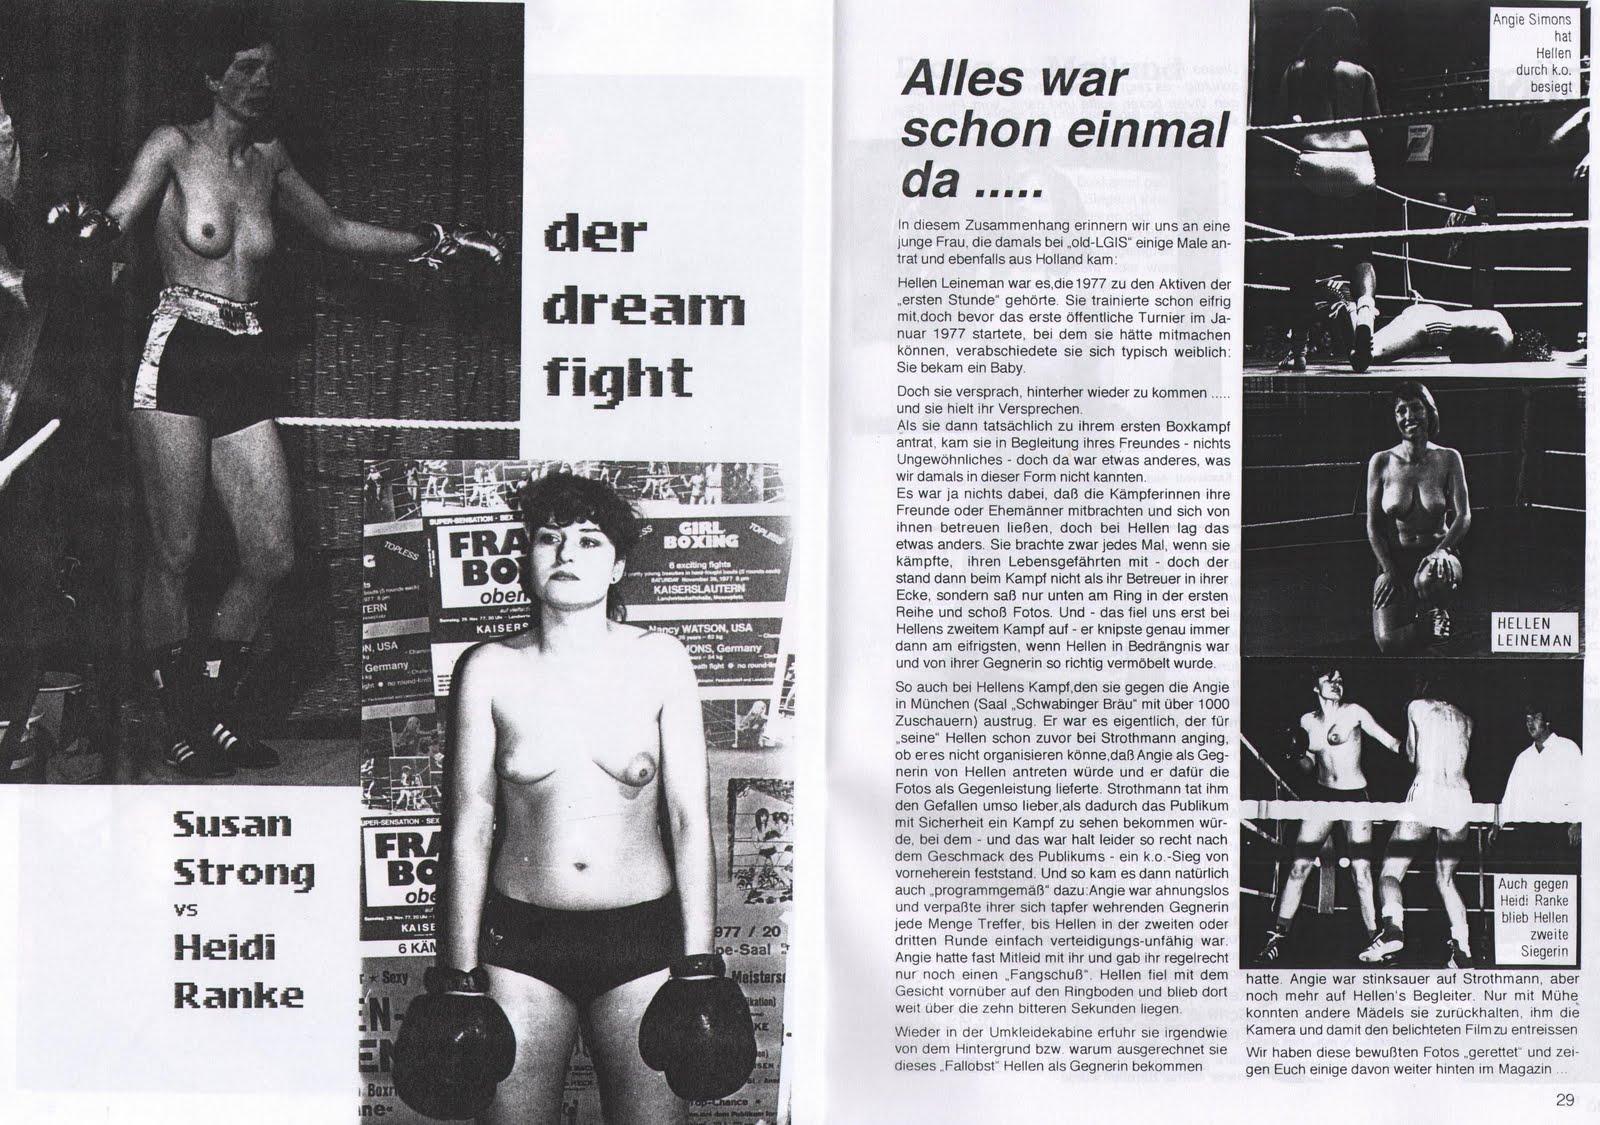 Femfight Fan http://femfighteurope.blogspot.com/2010_07_01_archive